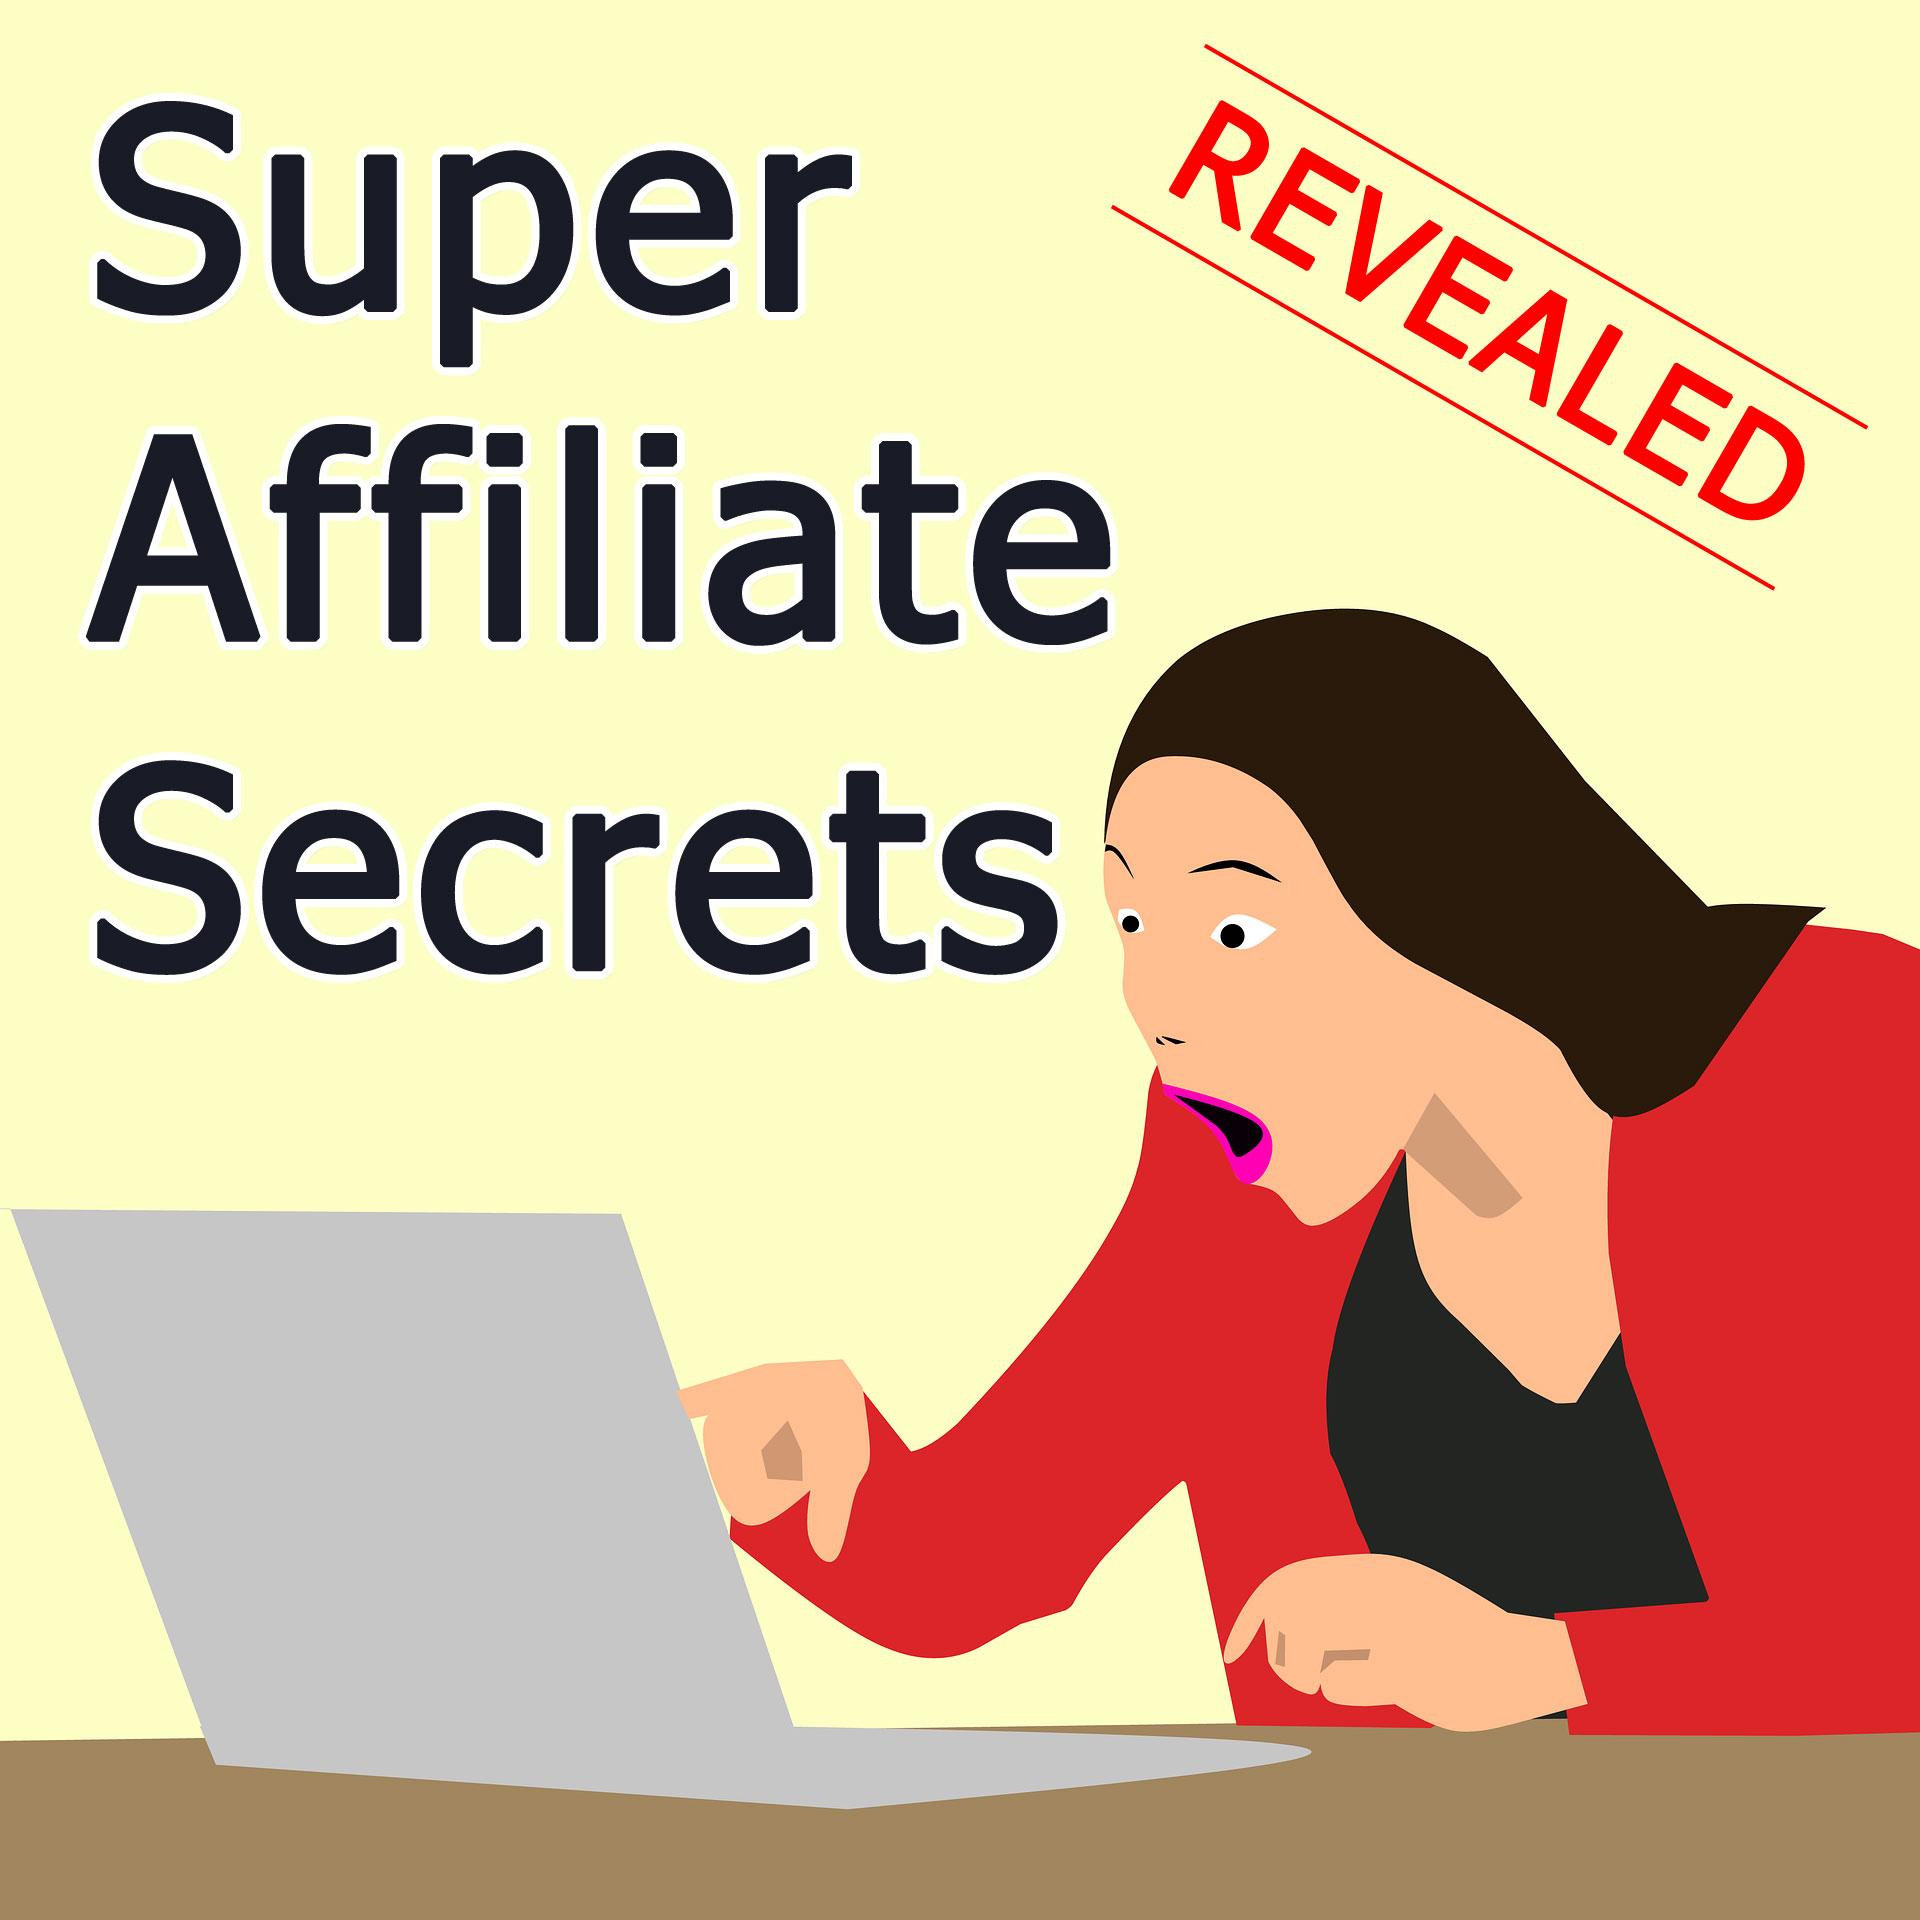 Affiliate Marketing Secrets Revealed